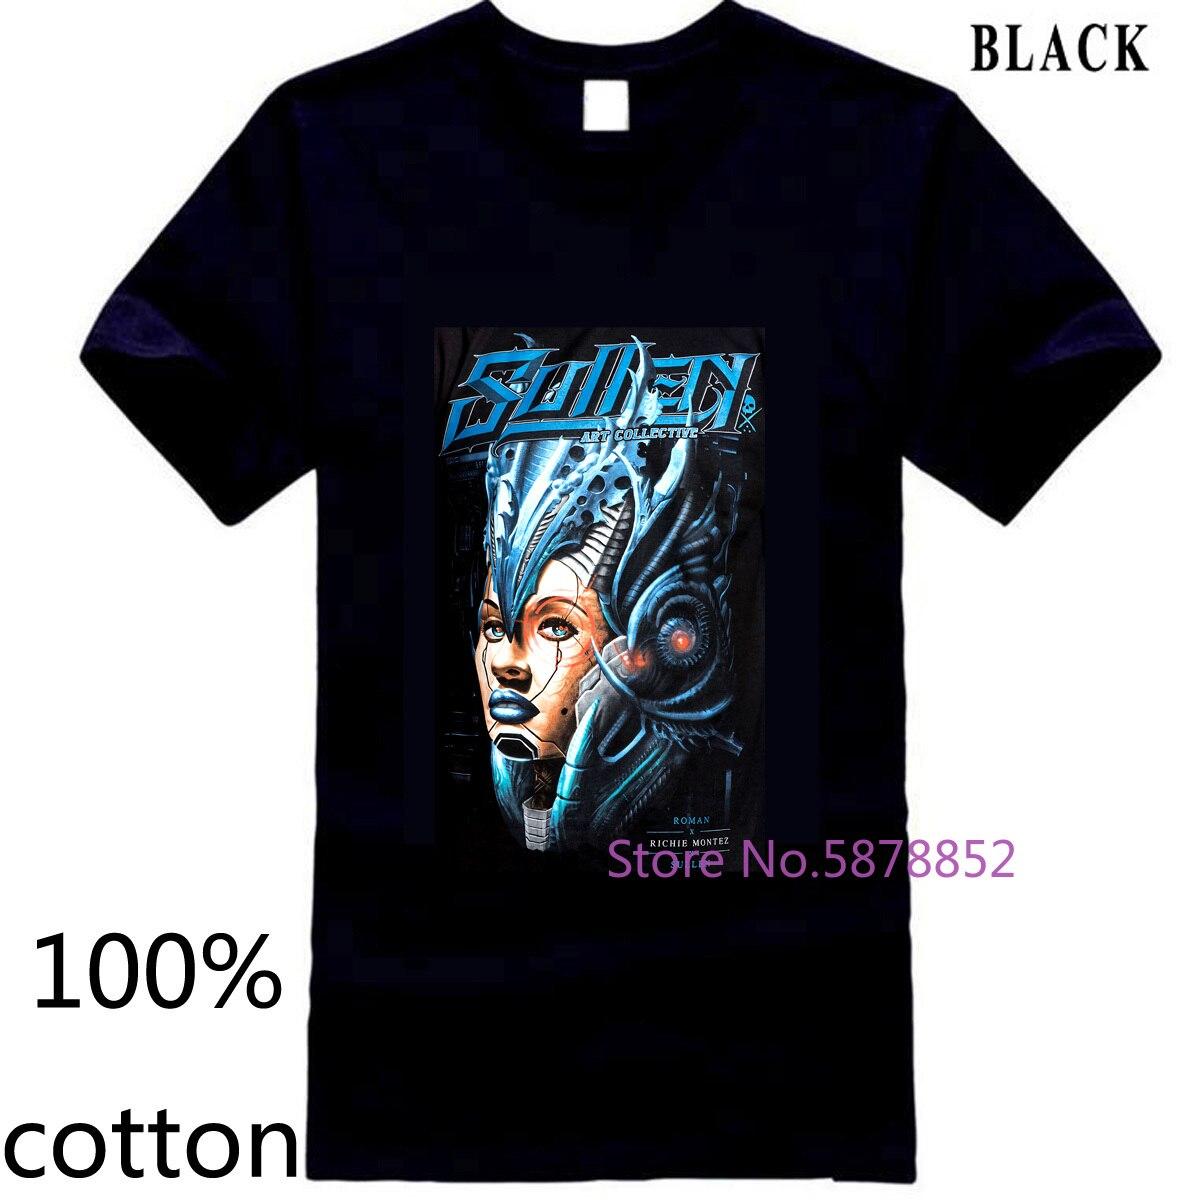 Sullen cyber roman abrego richie montez nova camisa masculina t camiseta topos camisetas 100% algodão 3xl 4xl 5xl manga curta